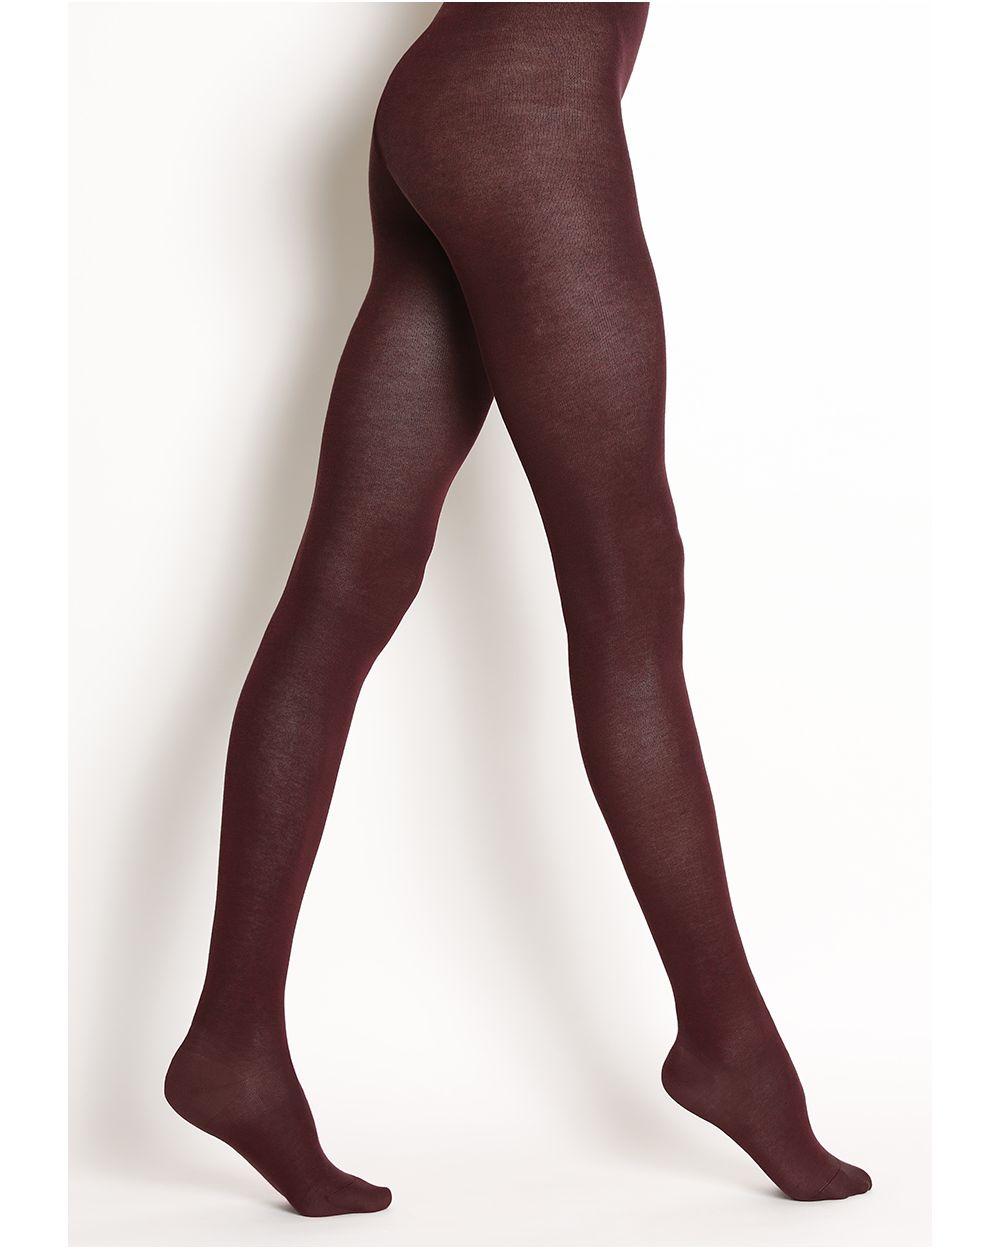 Velvet pure cotton tights